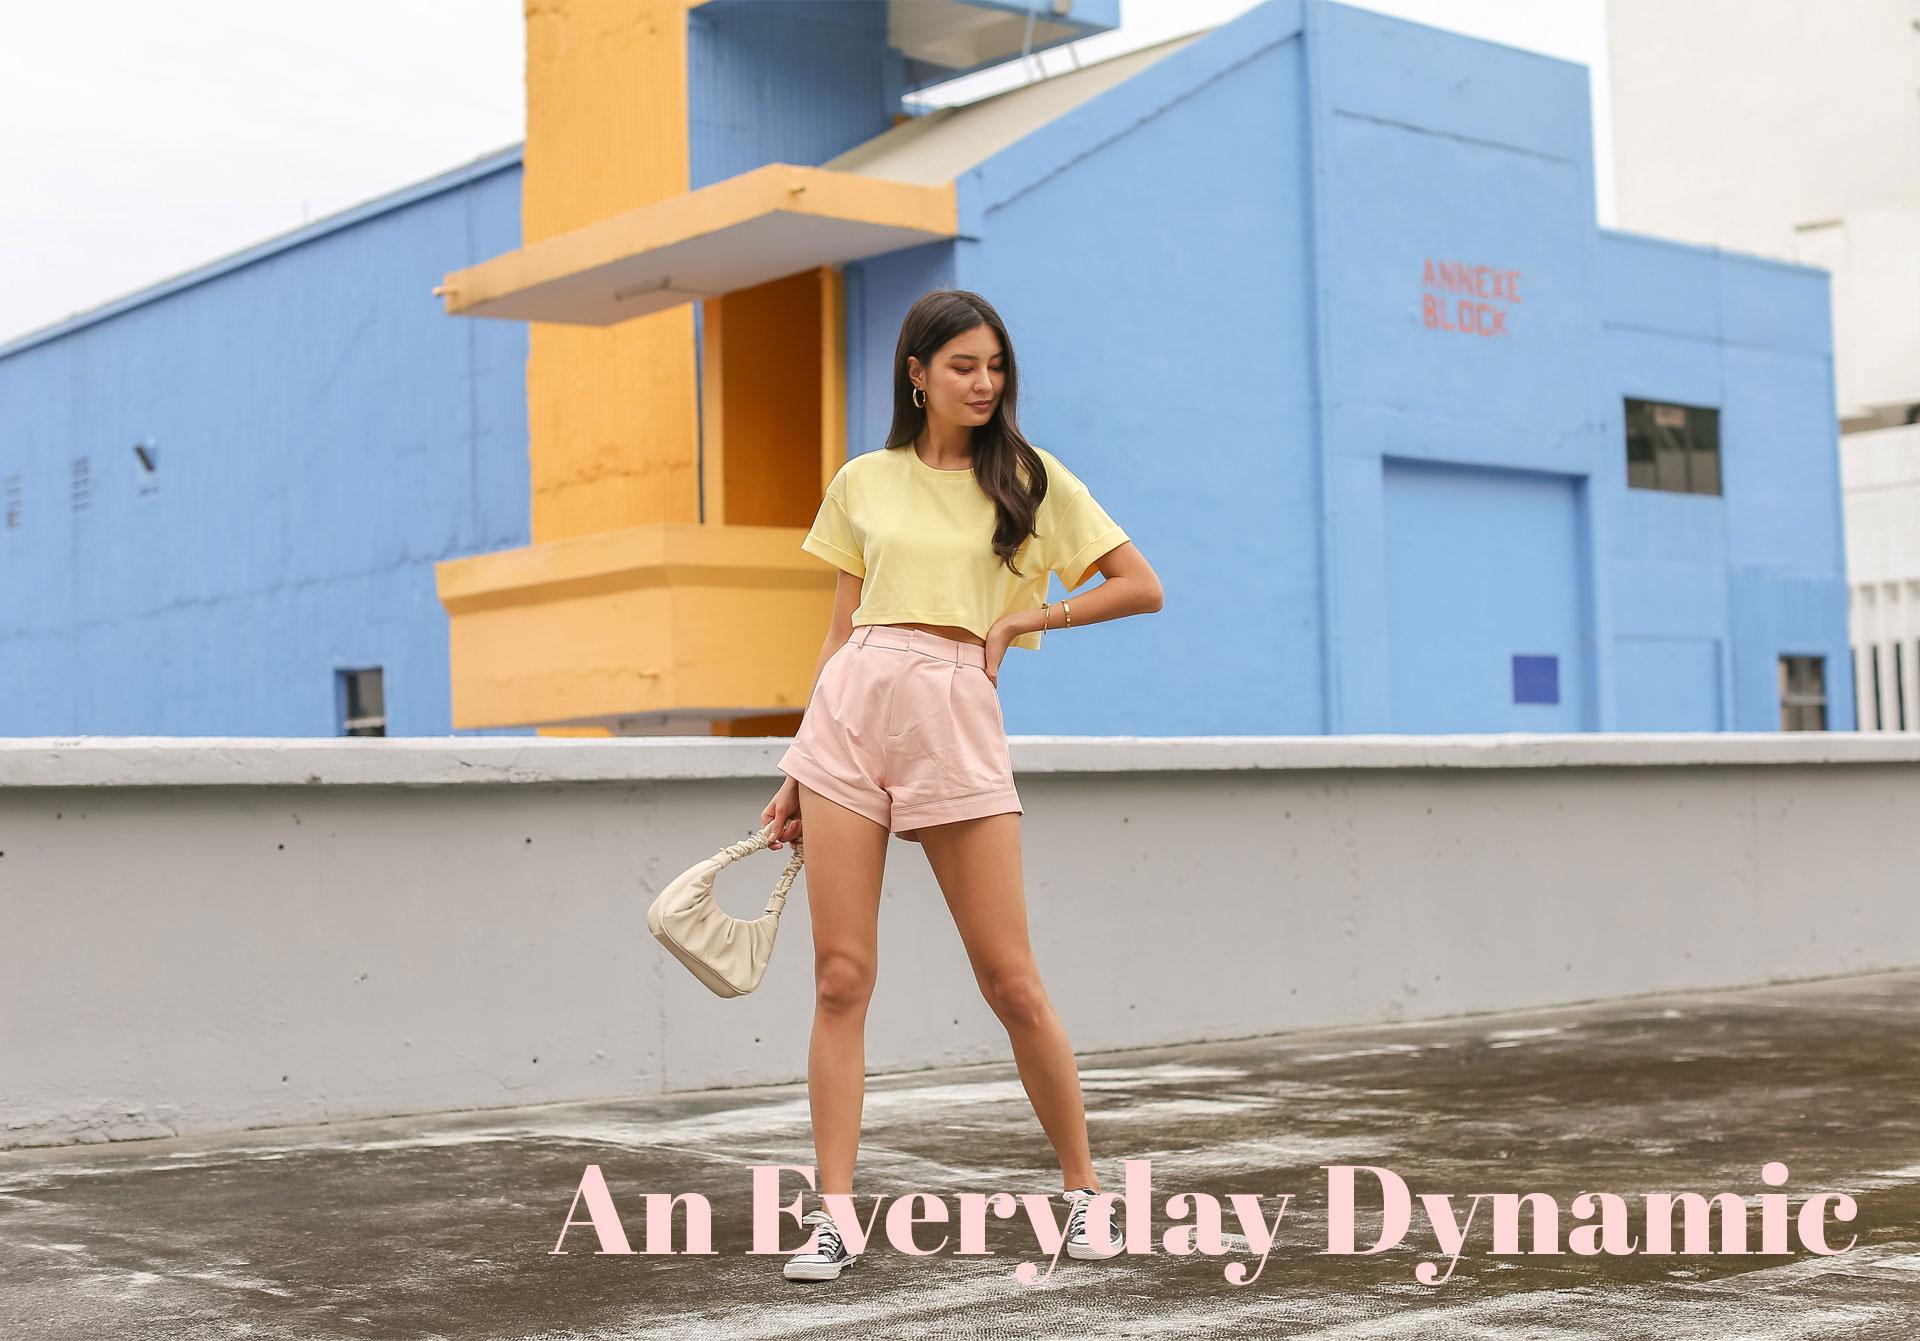 An Everyday Dynamic